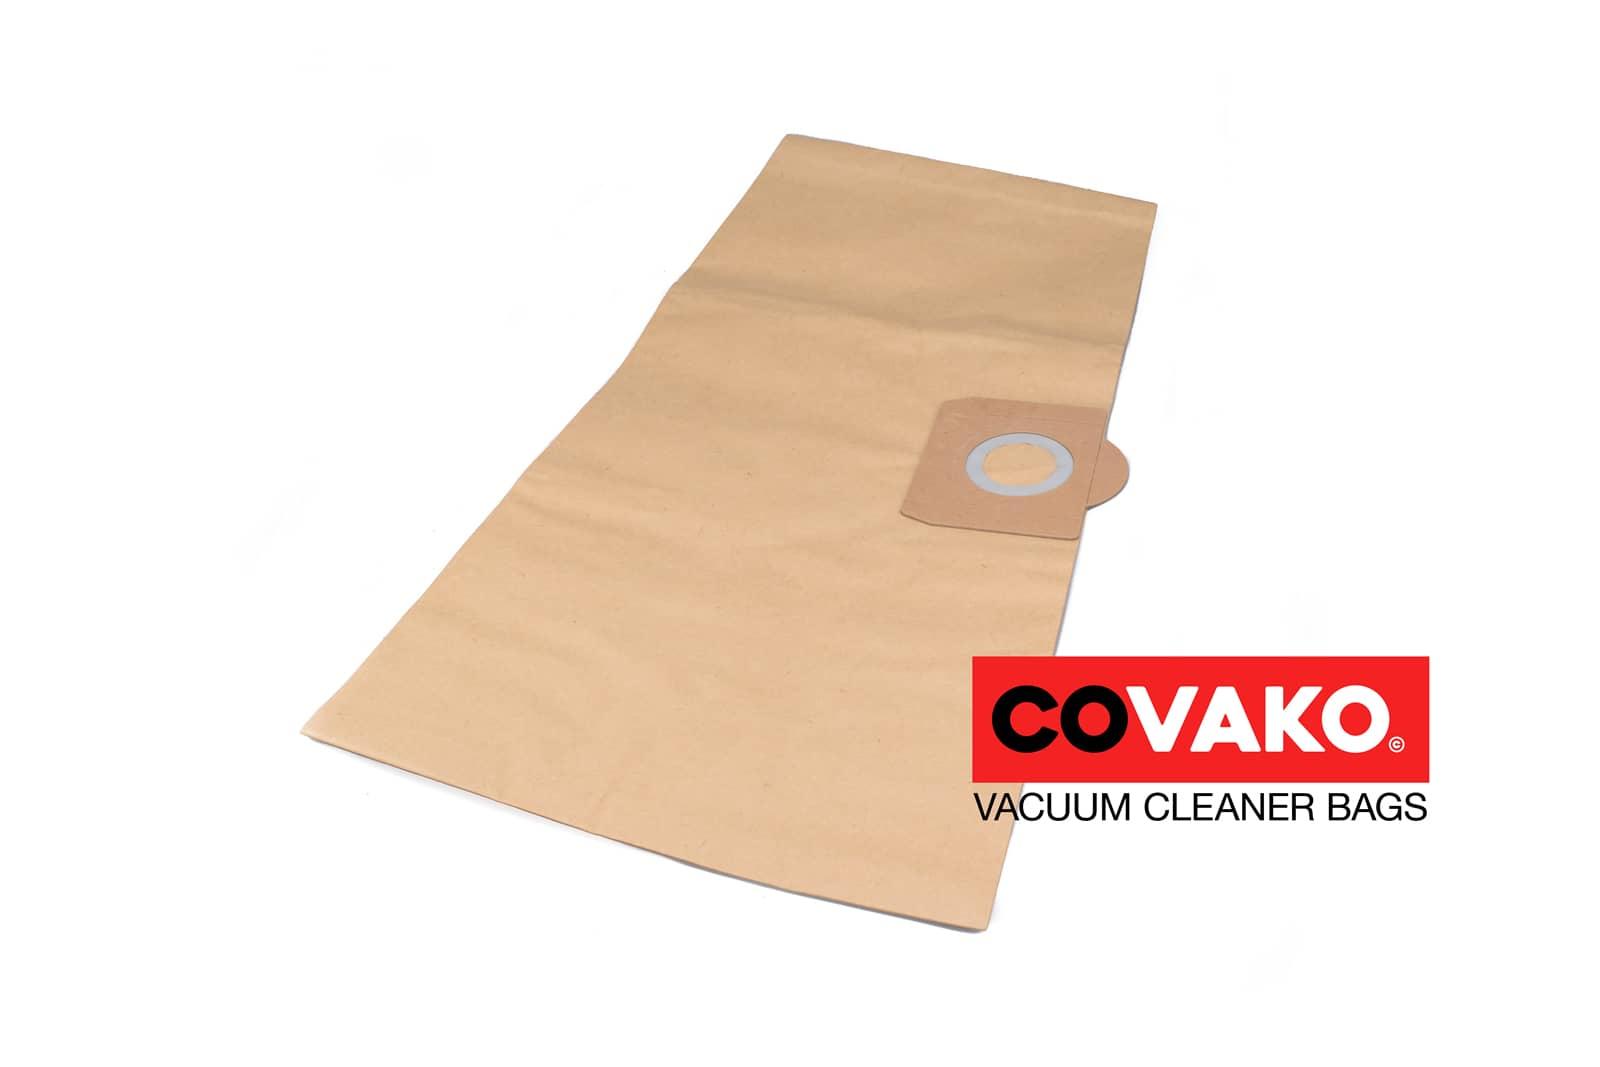 Soteco Dakota Compact 101 Spot / Paper - Soteco vacuum cleaner bags